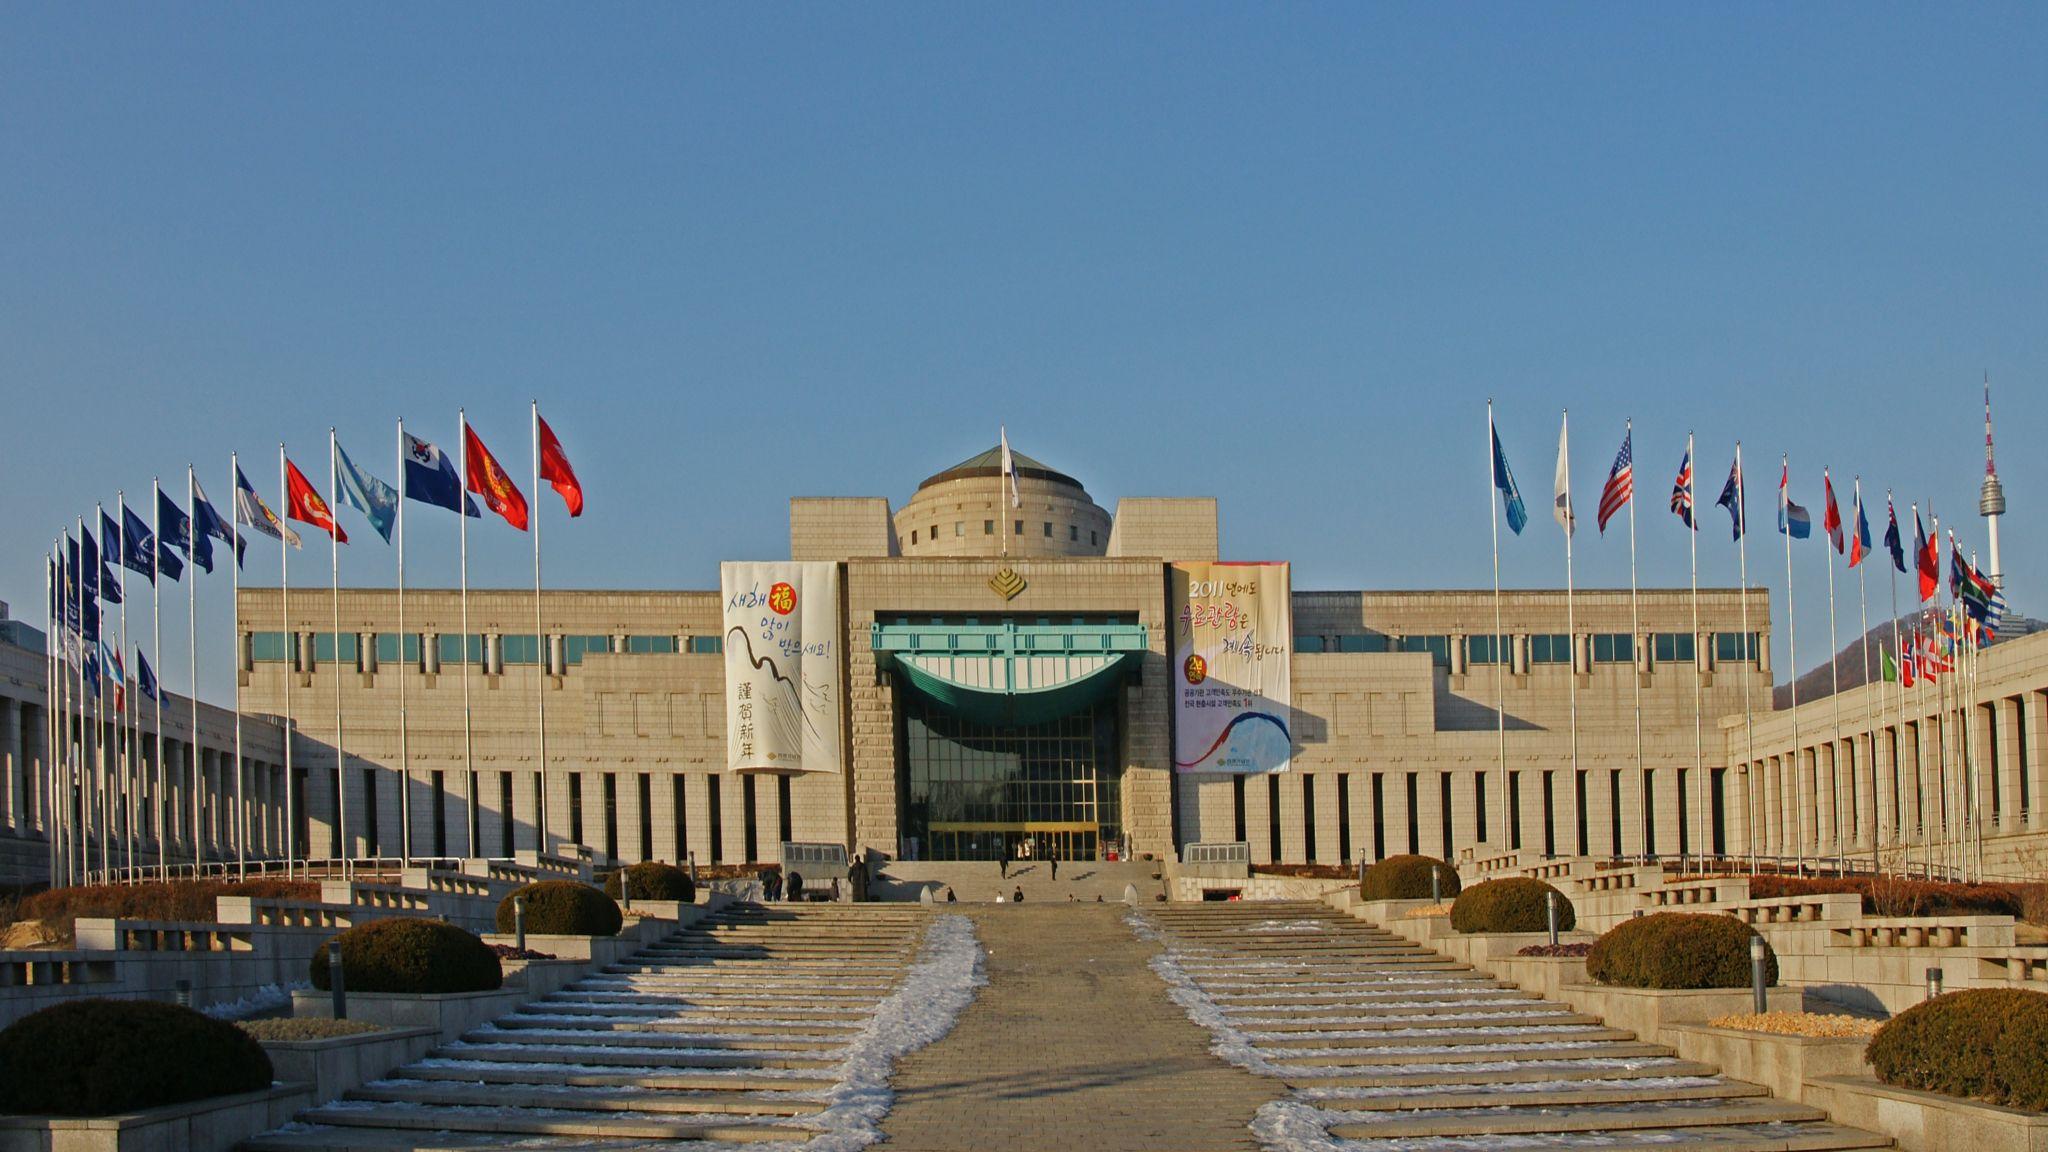 War Memorial of Korea, Korea